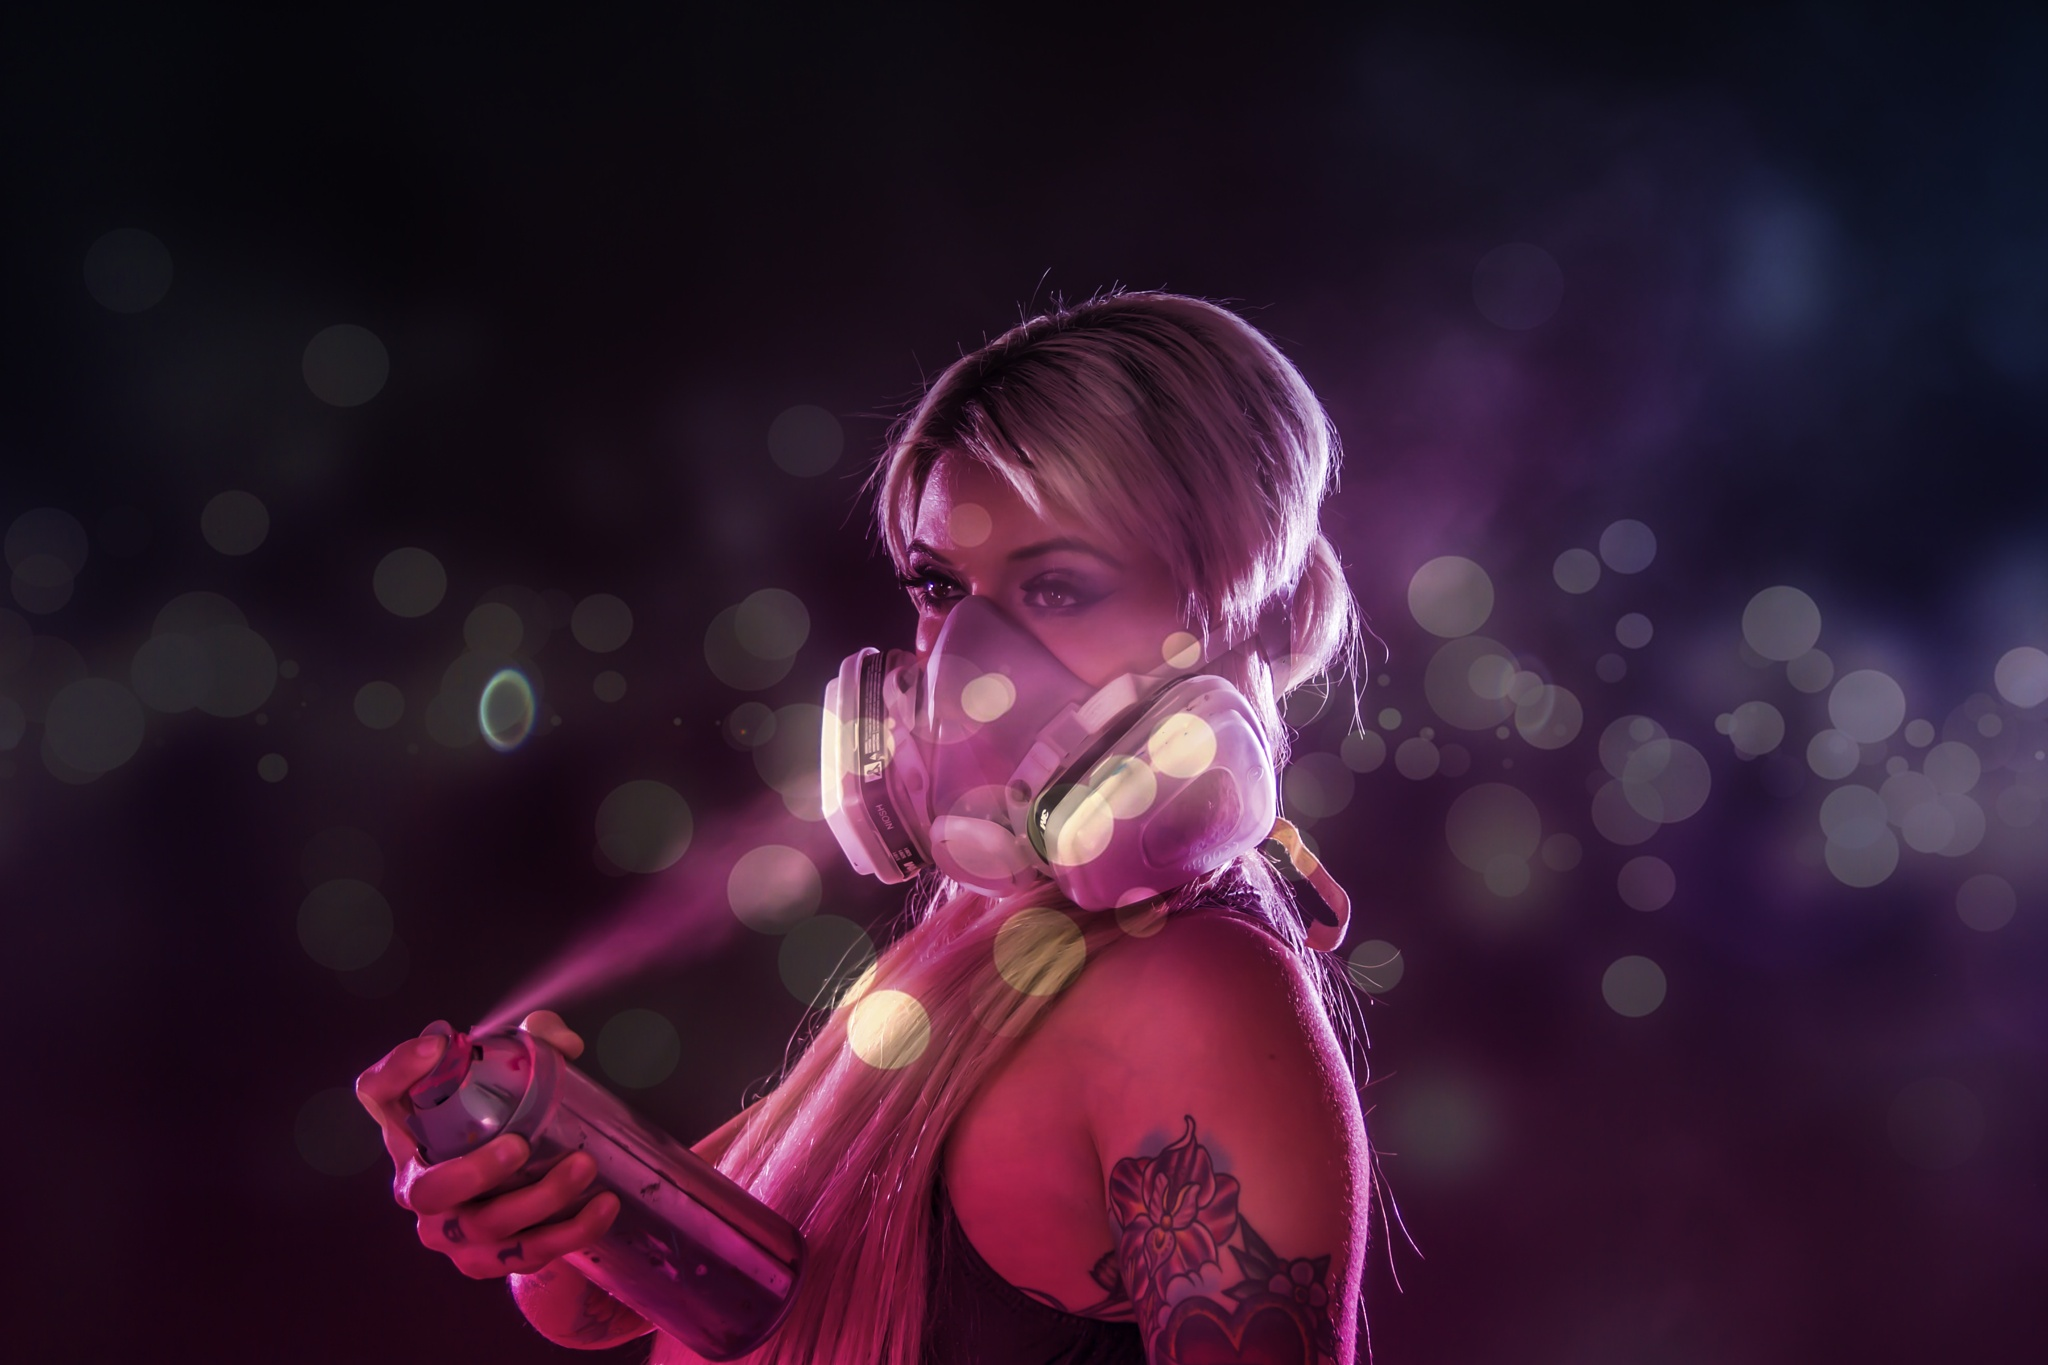 Graffiti Dreams 2 by shotbyray